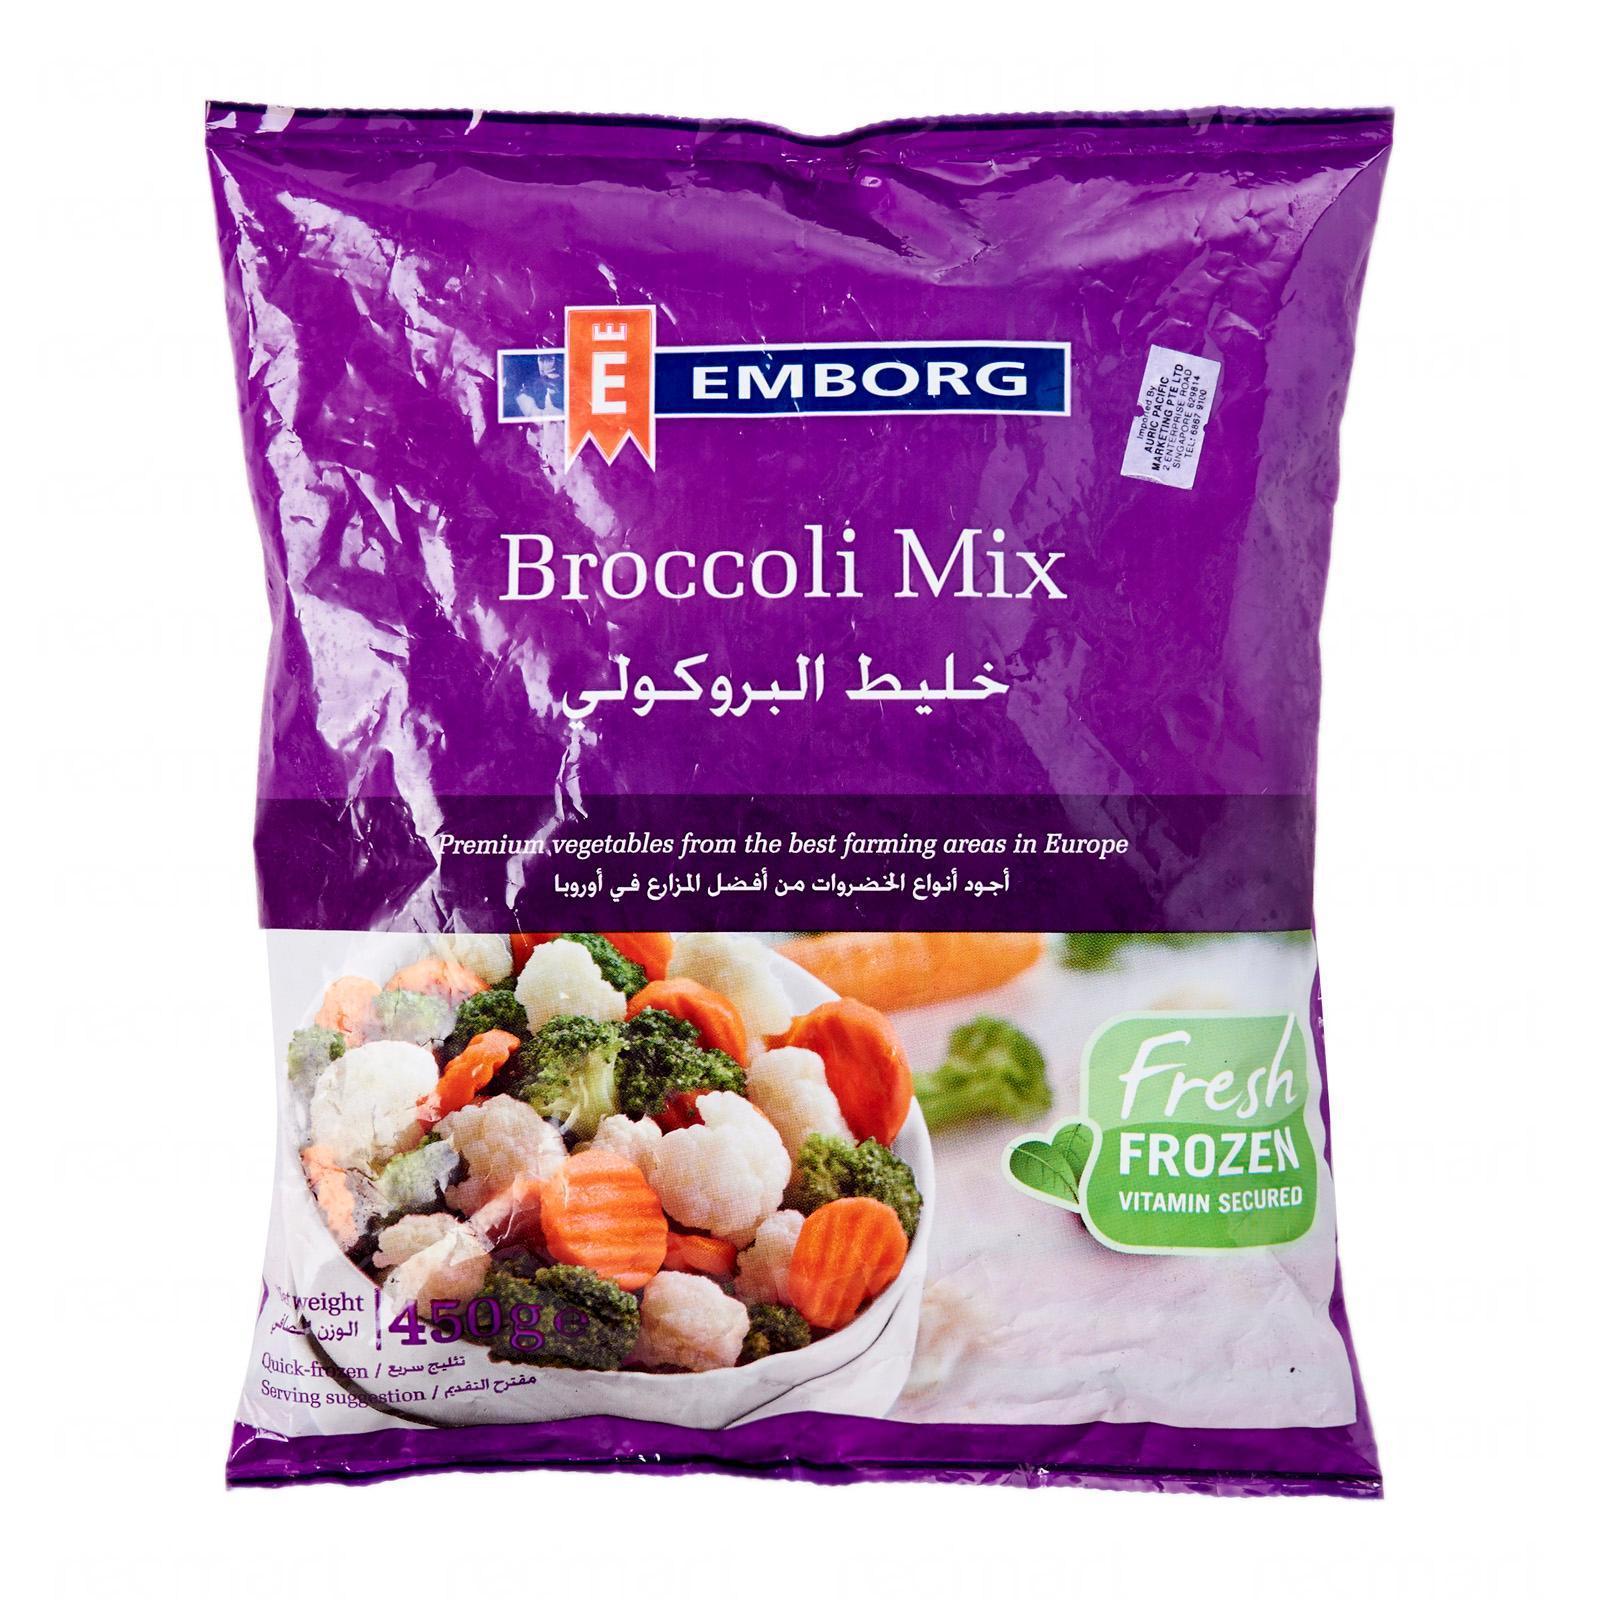 Emborg Broccoli Mix - Frozen By Redmart.